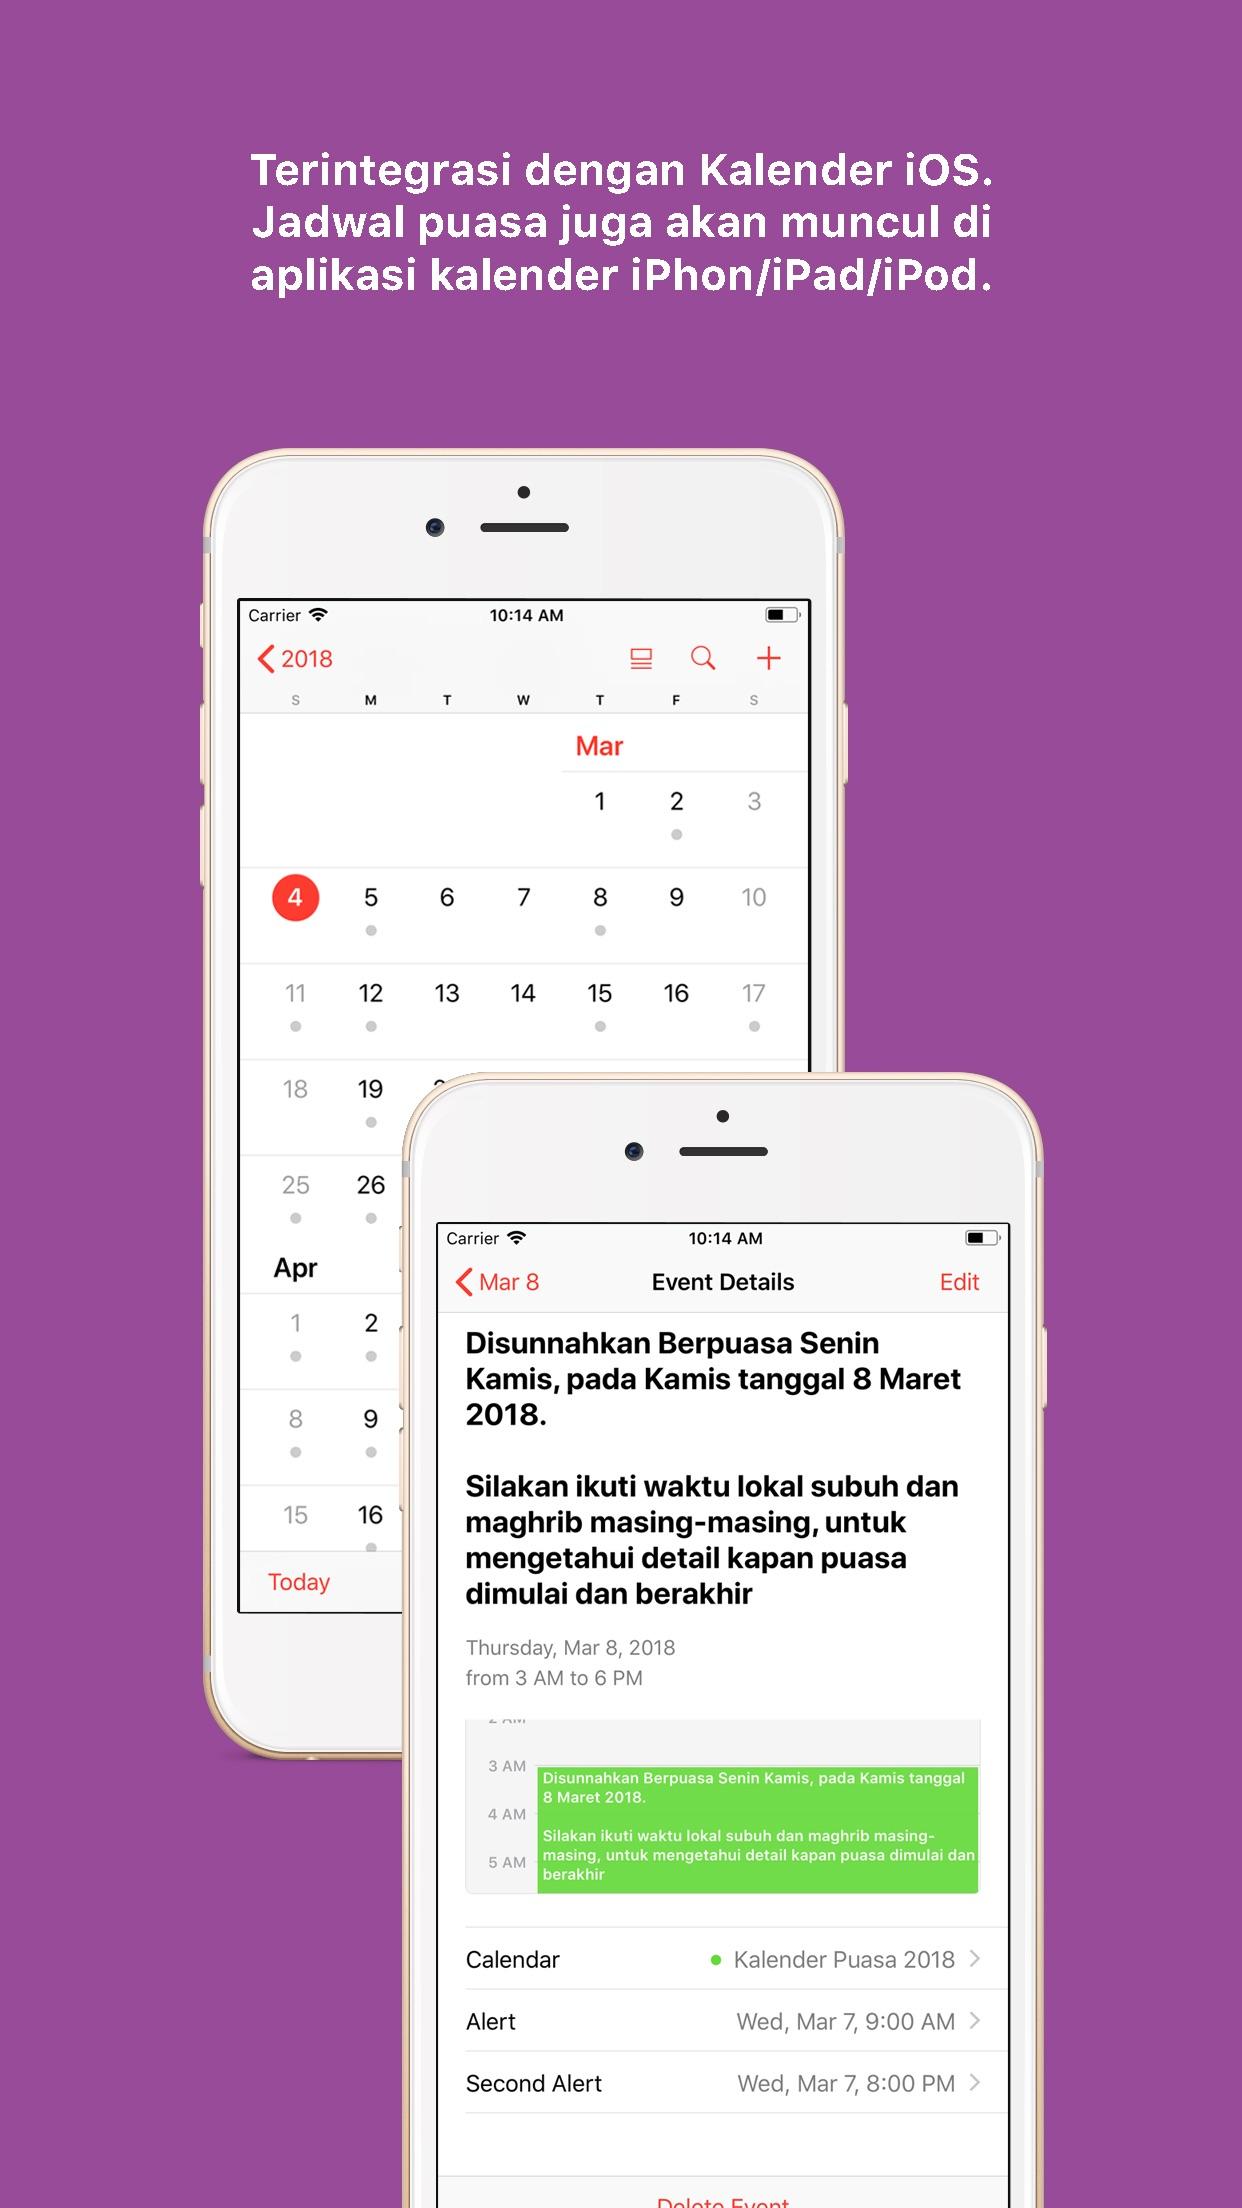 Kalender Puasa 2019 Screenshot